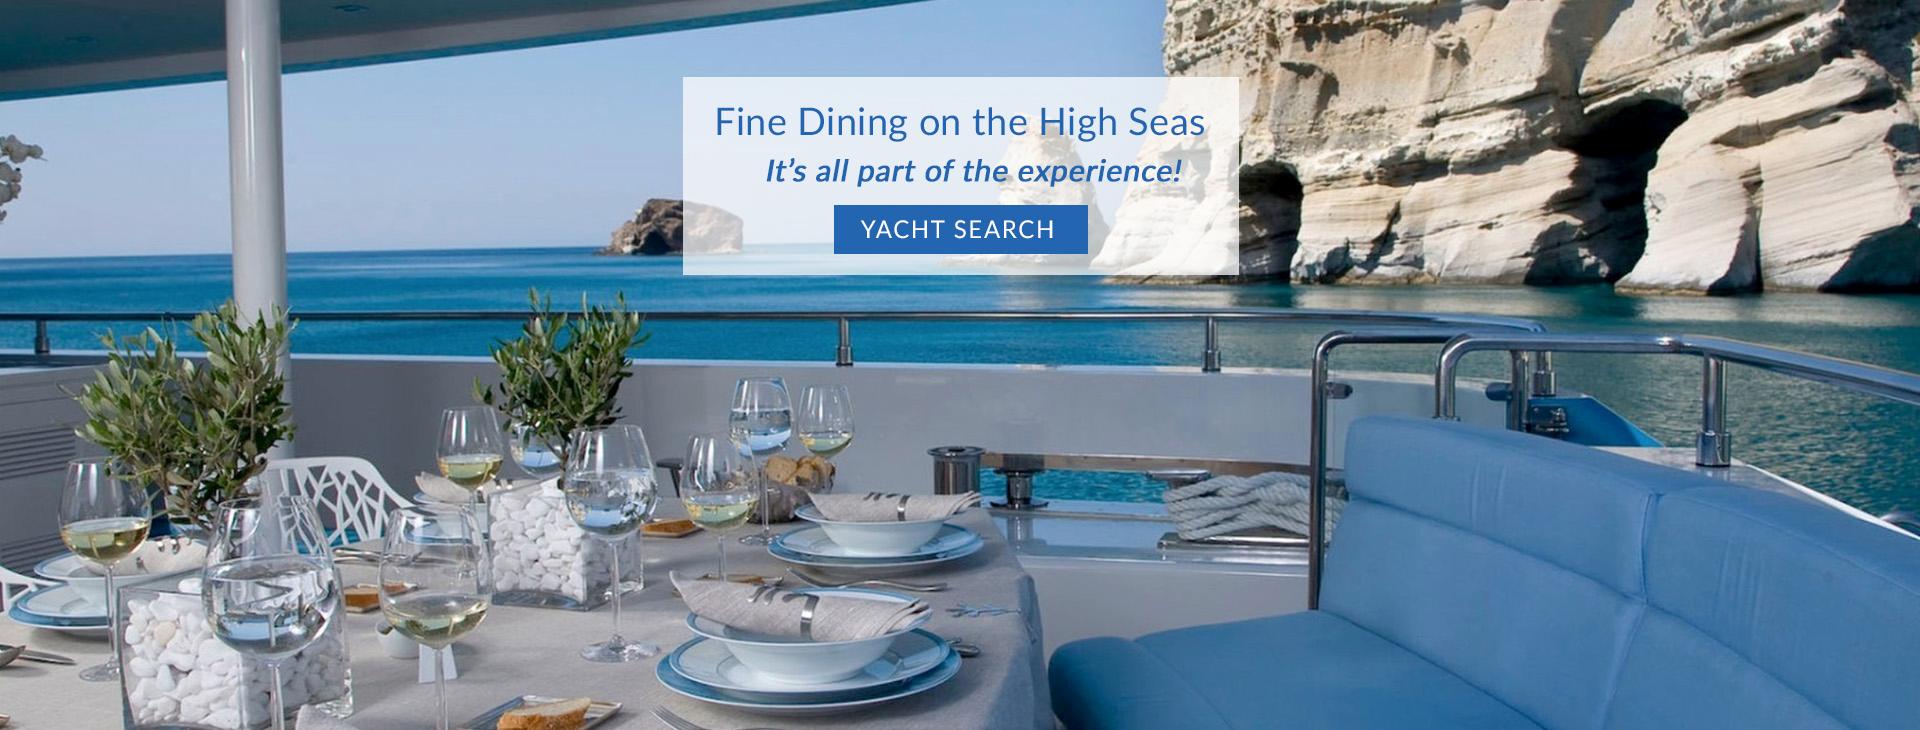 Fine dining al fresco on the motor yacht BARENTS SEA in the Mediterranean